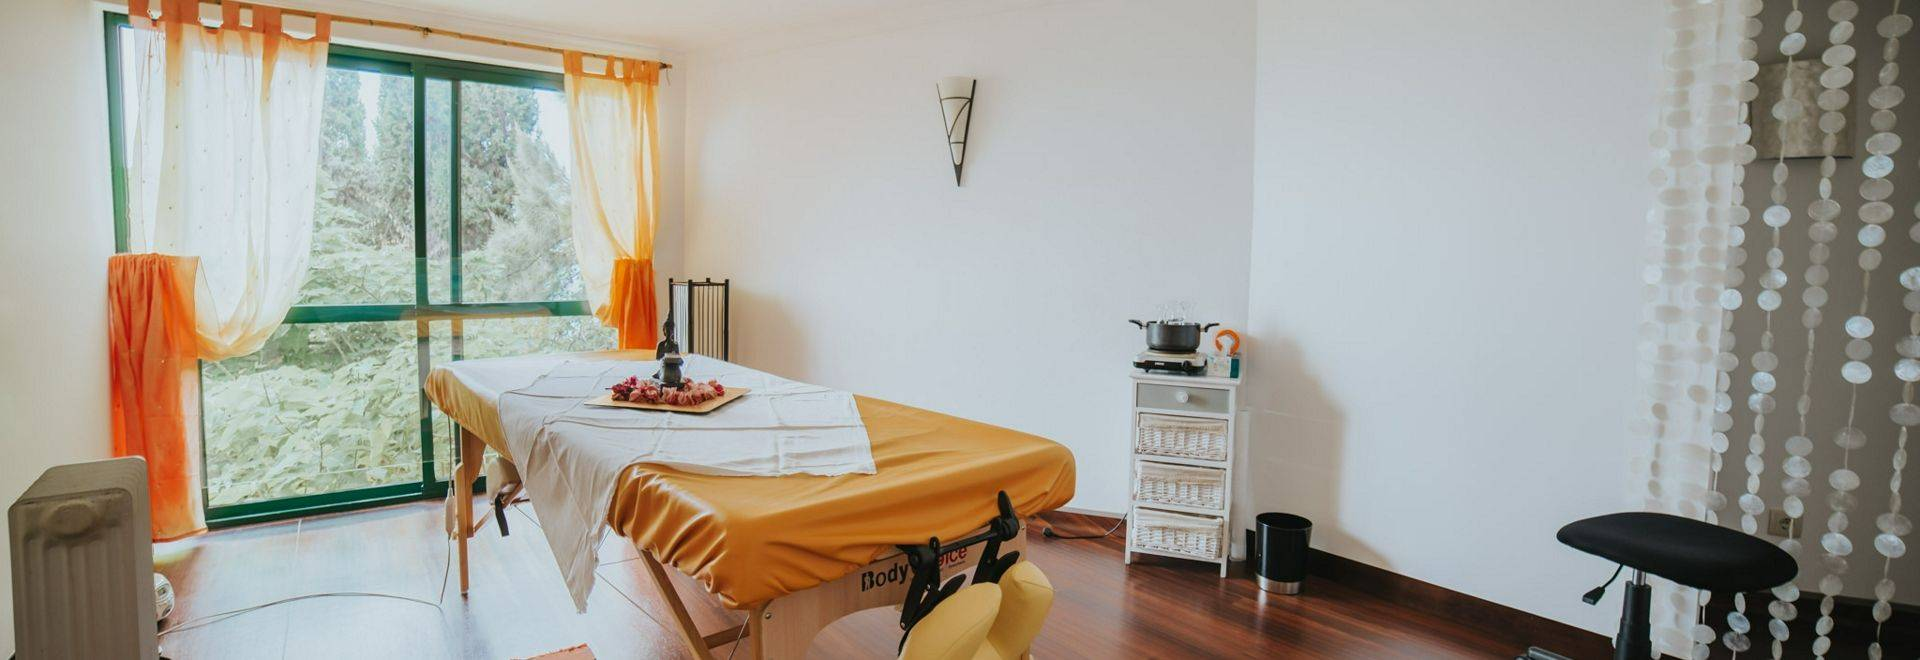 Galo-Resort-spa-treatment-room.jpg